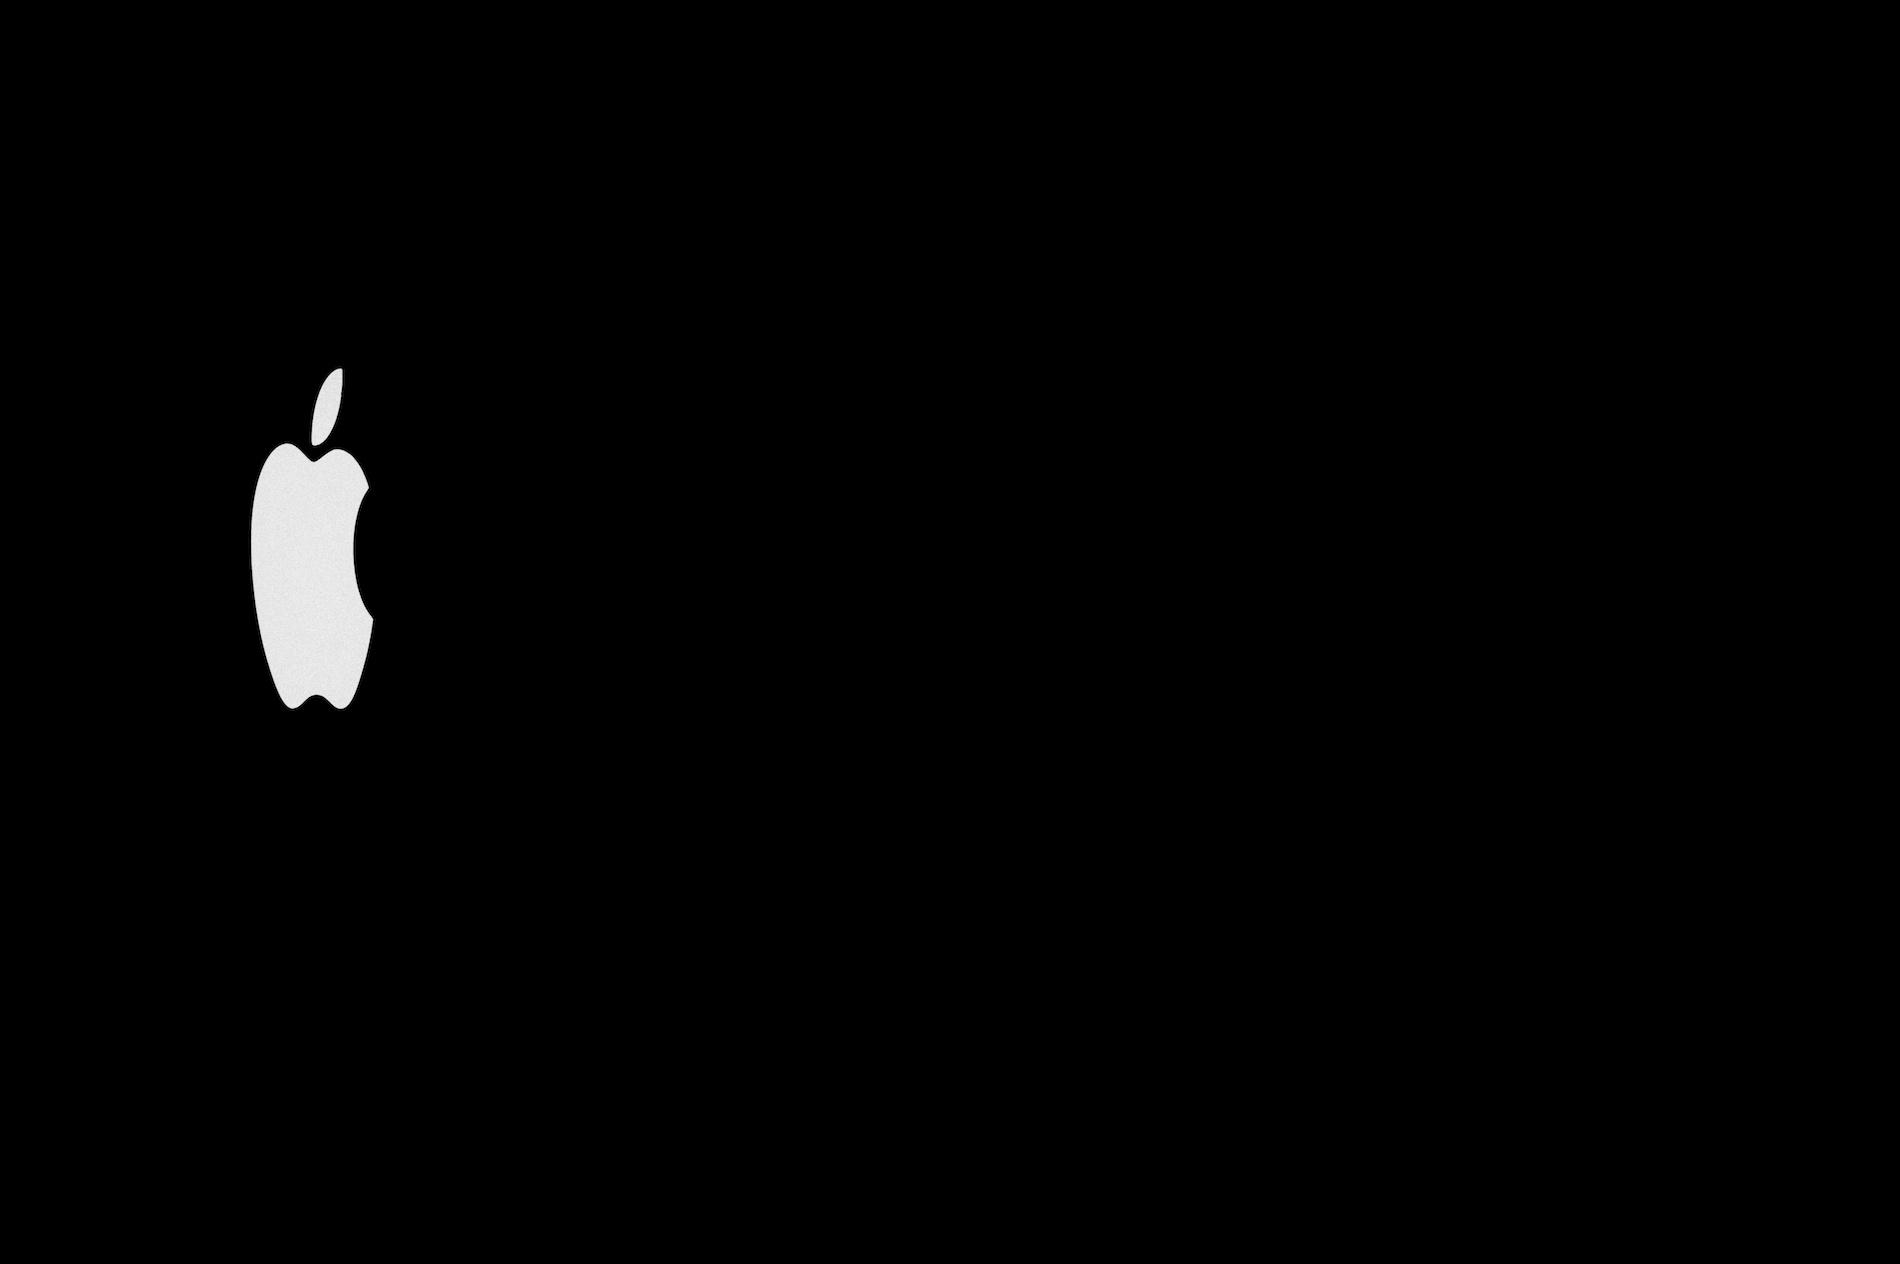 2011-10-06 at 06-49-05, Apple.jpg